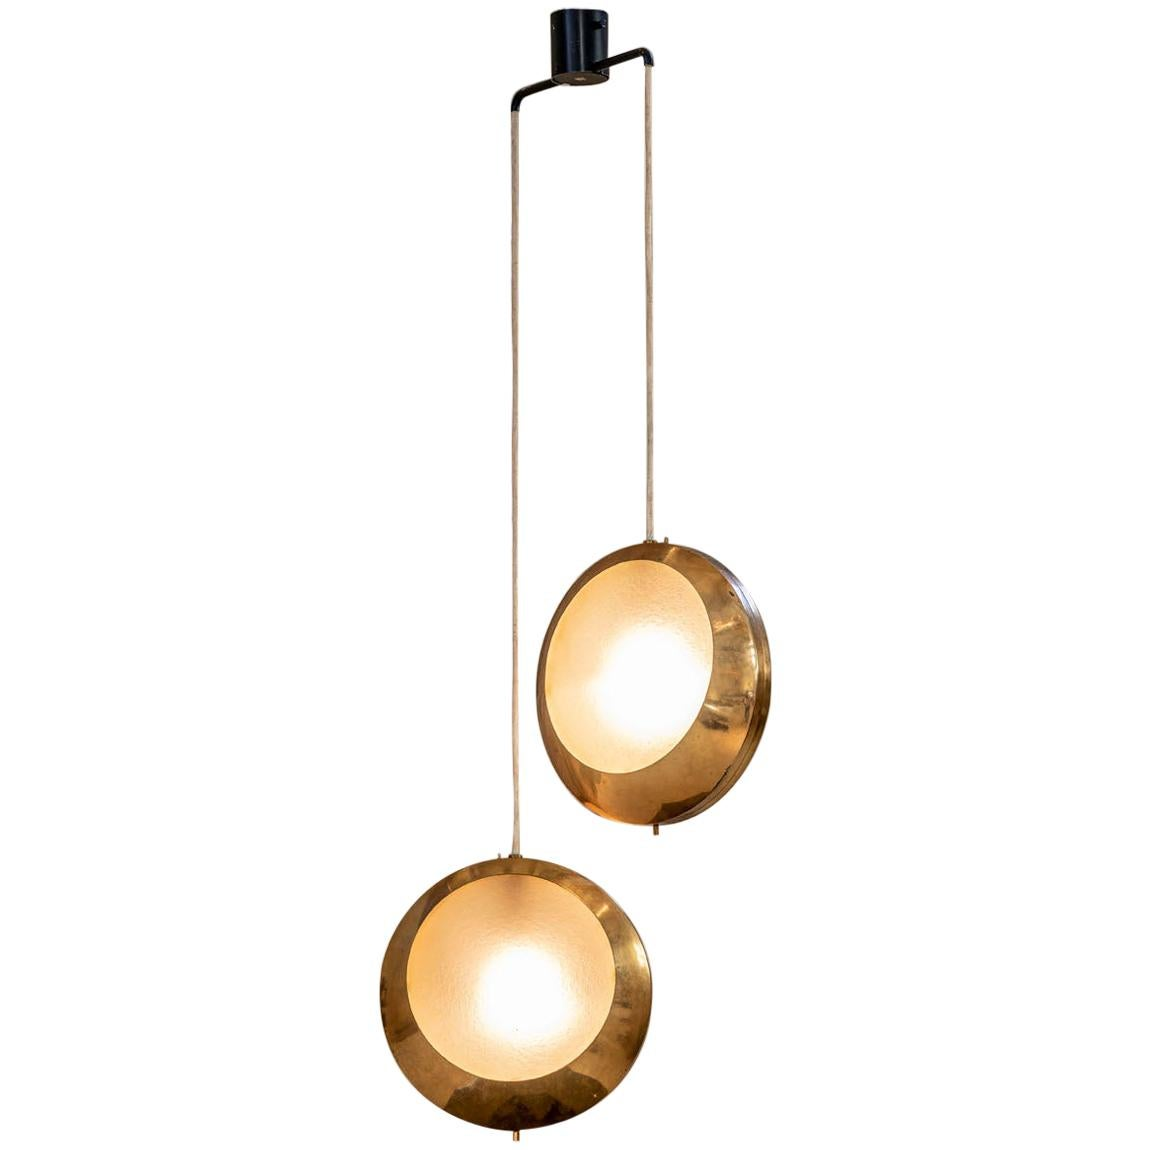 Brass and Glass Pendant by Stilnovo